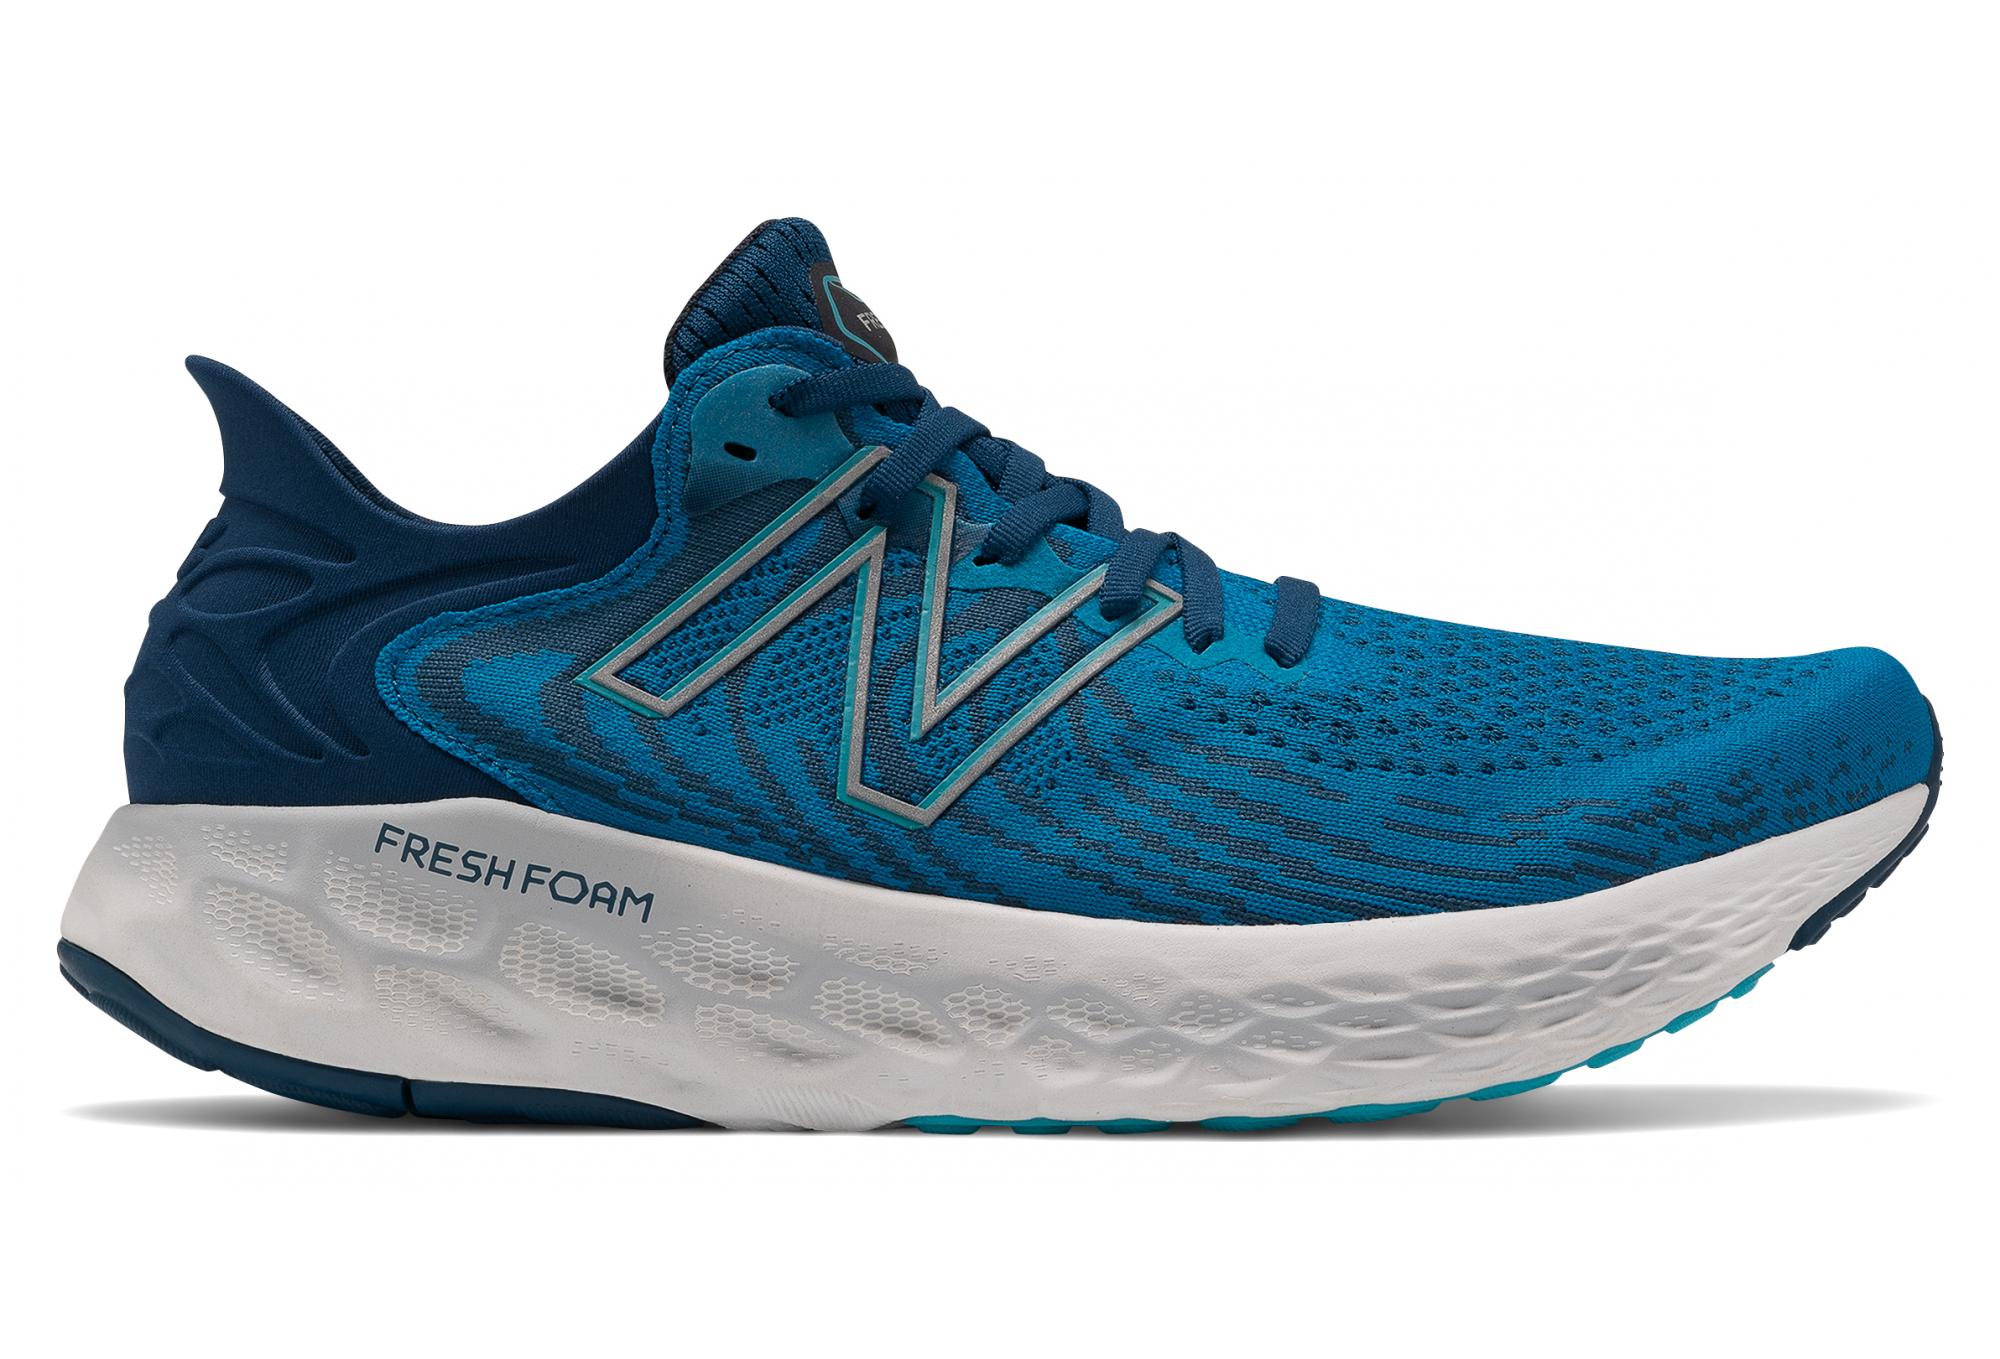 New Balance Fresh Foam X 1080 V11 Running Shoes Blue Mens